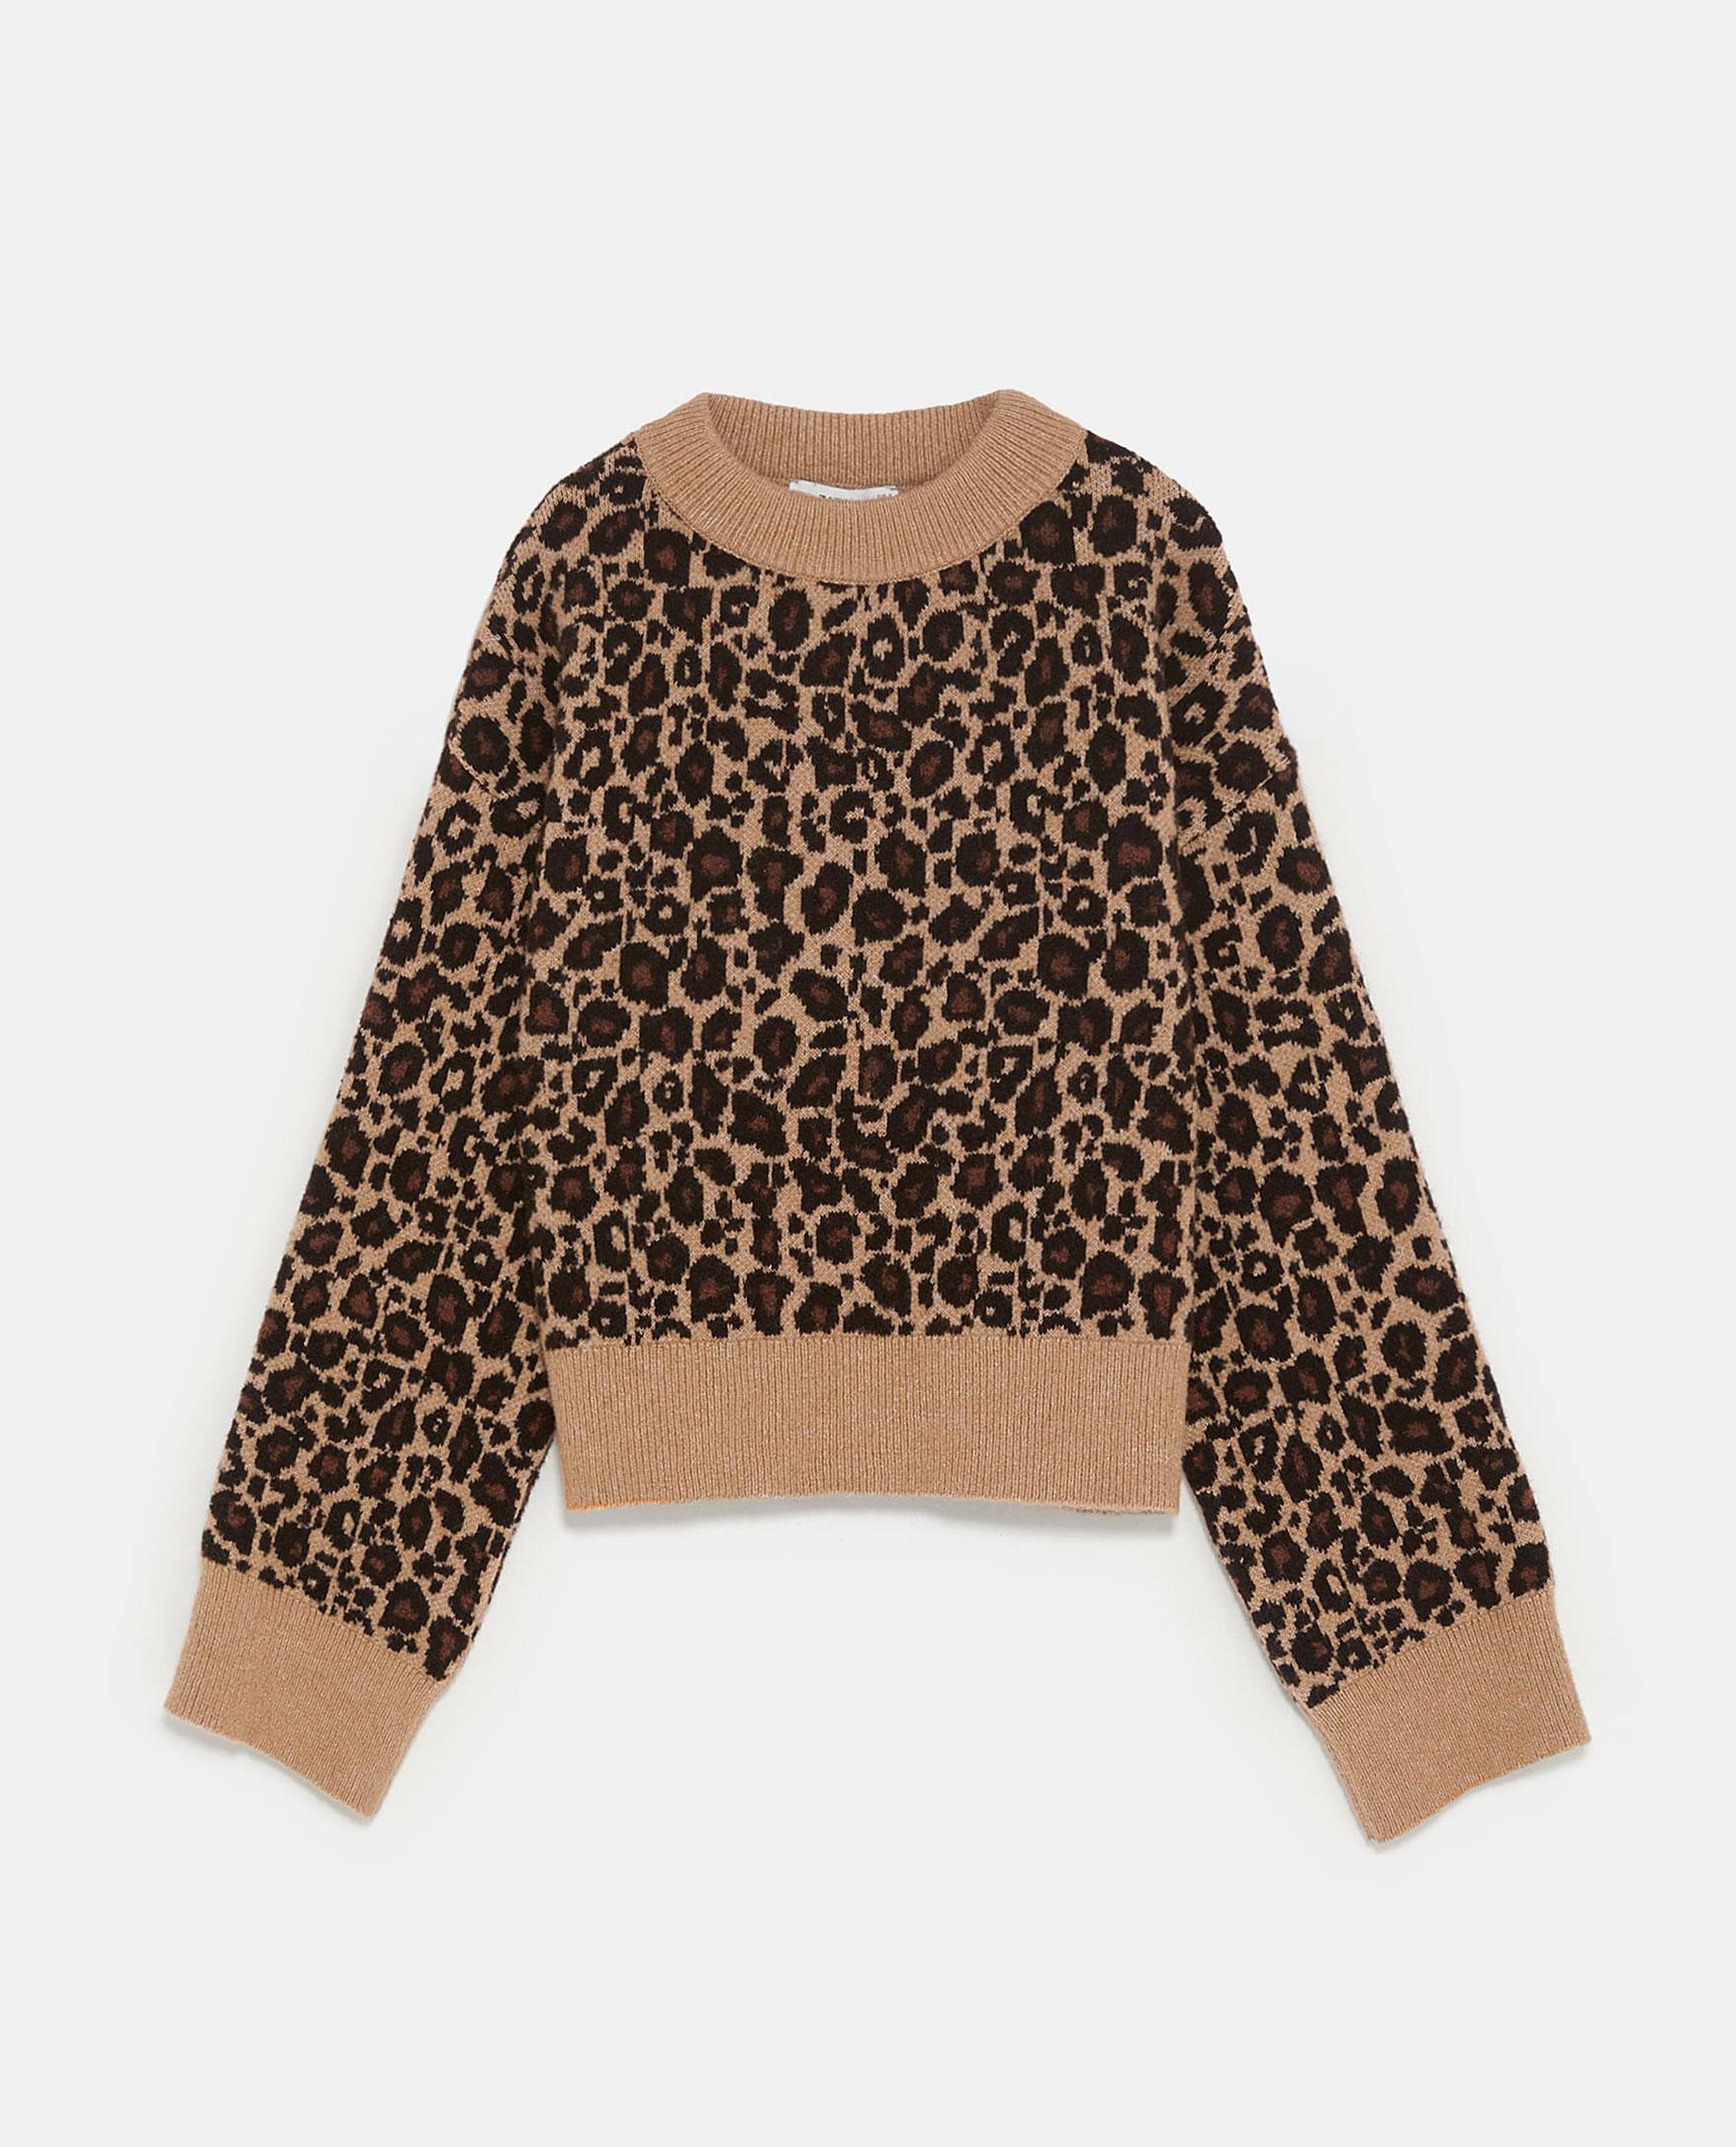 Zara Leopard Sweater       $25.99